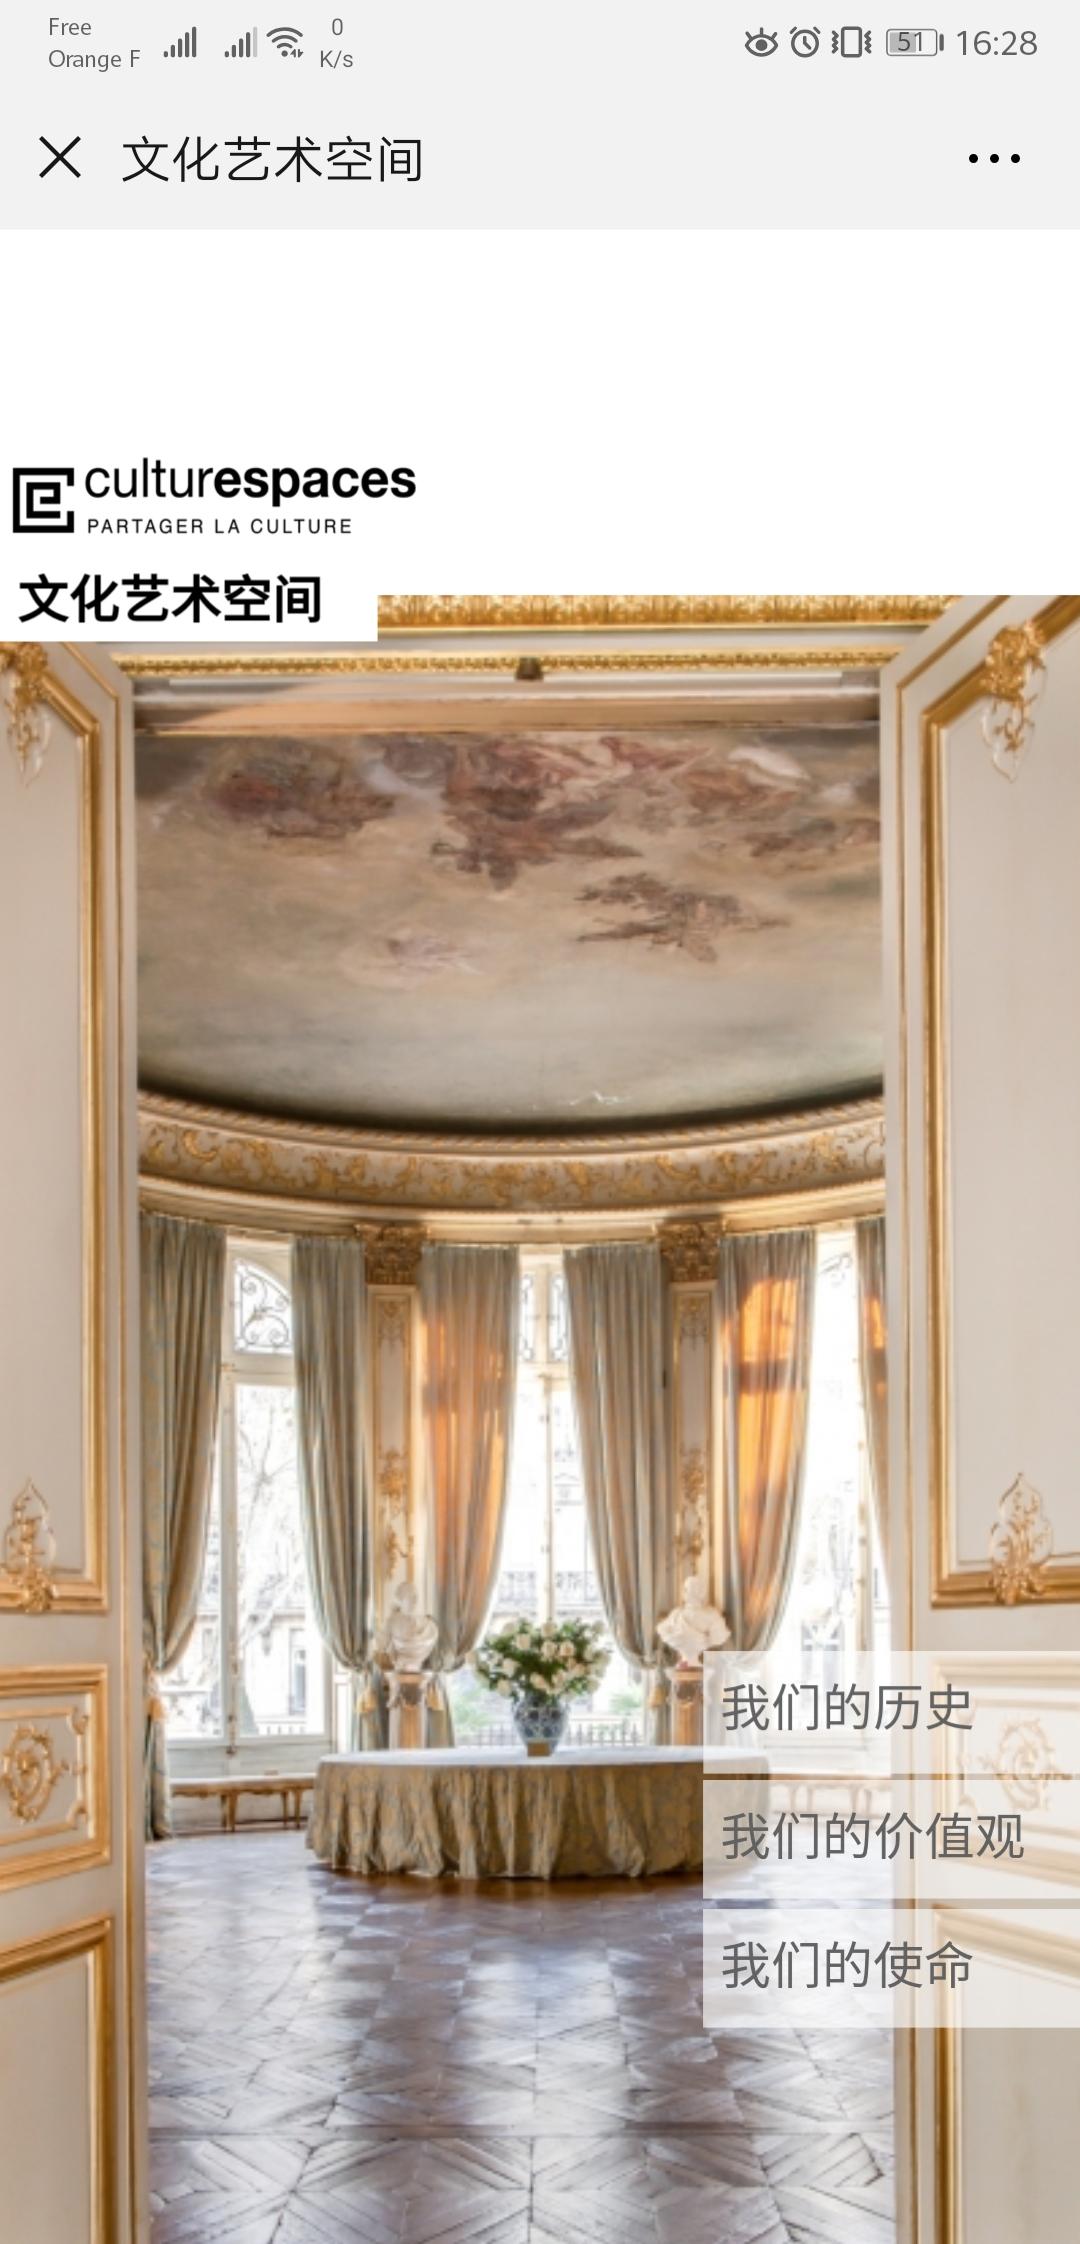 CULTURESPACES WeChat account